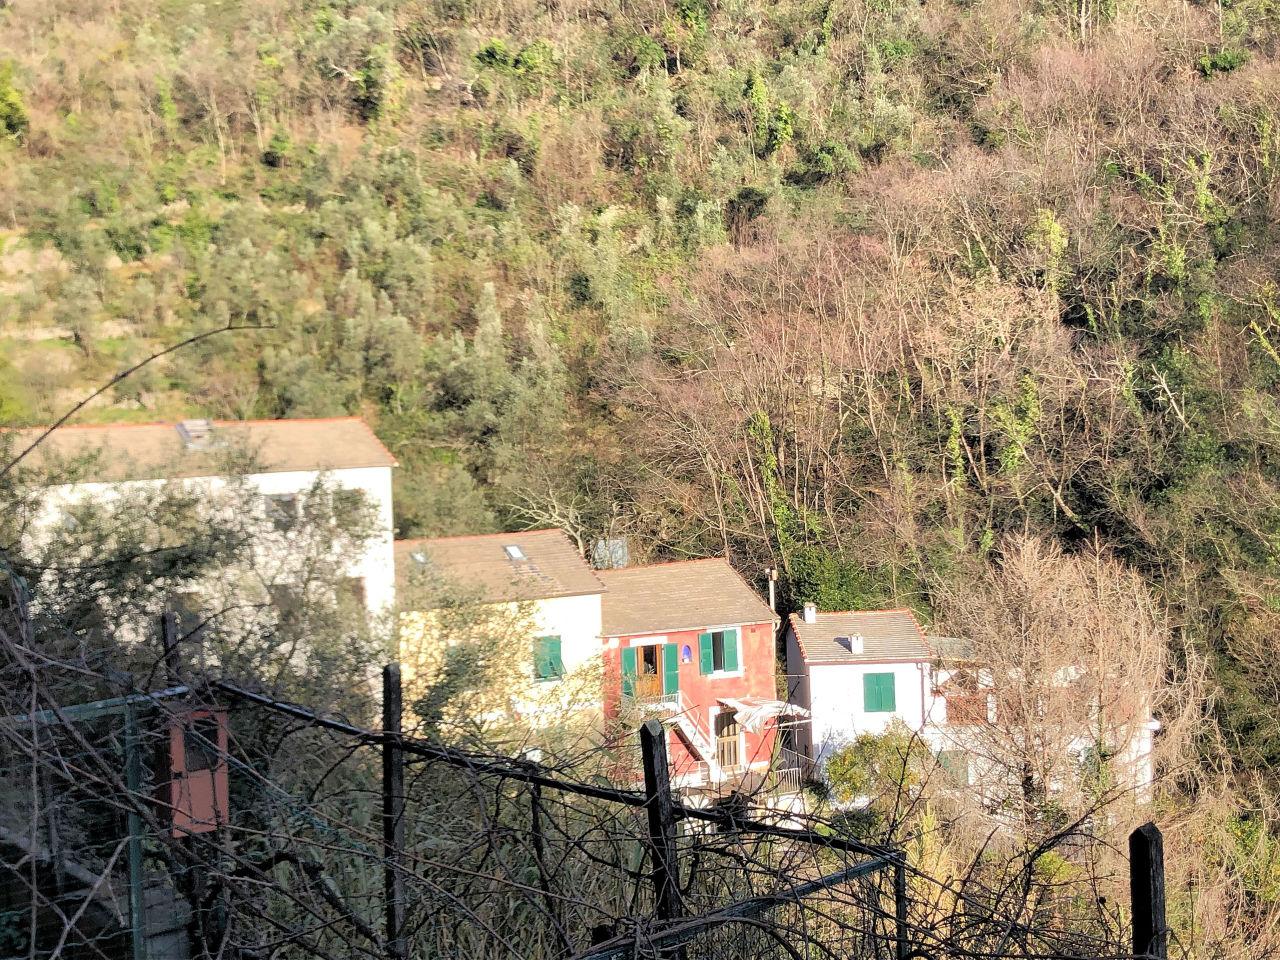 Casa Indipendente in discrete condizioni in vendita Rif. 9917894